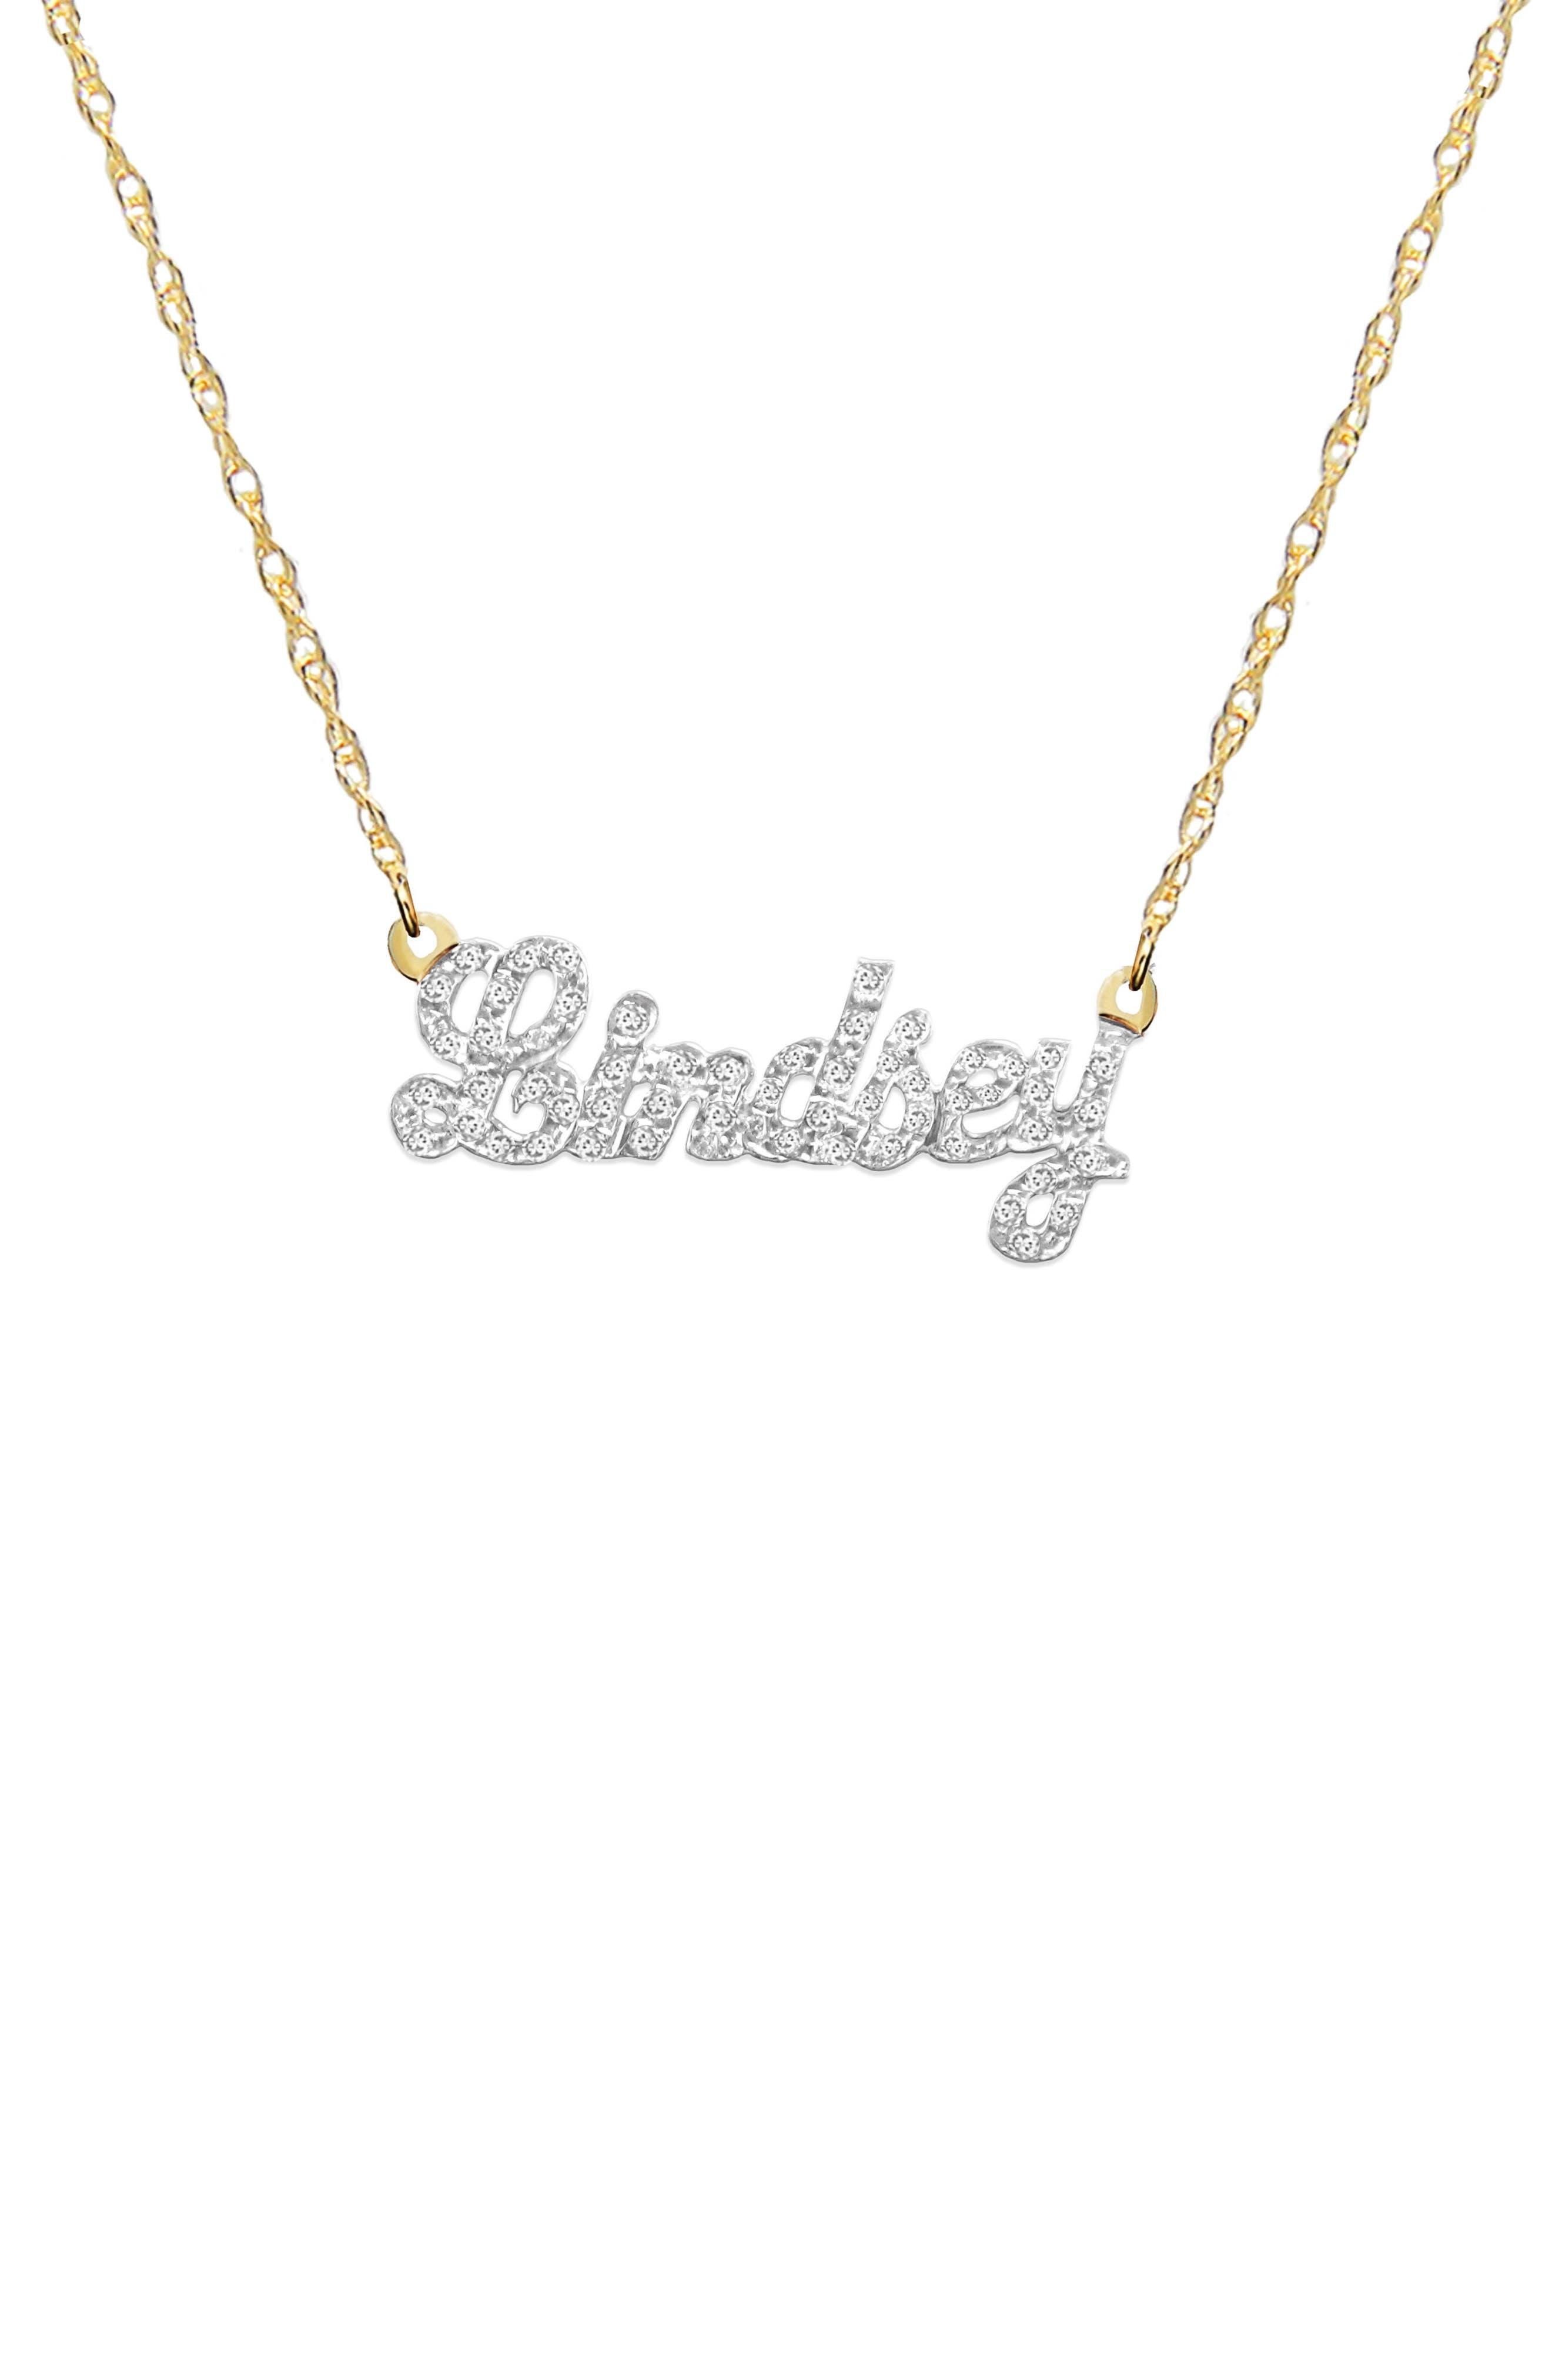 Personalized Nameplate Diamond Pendant Necklace